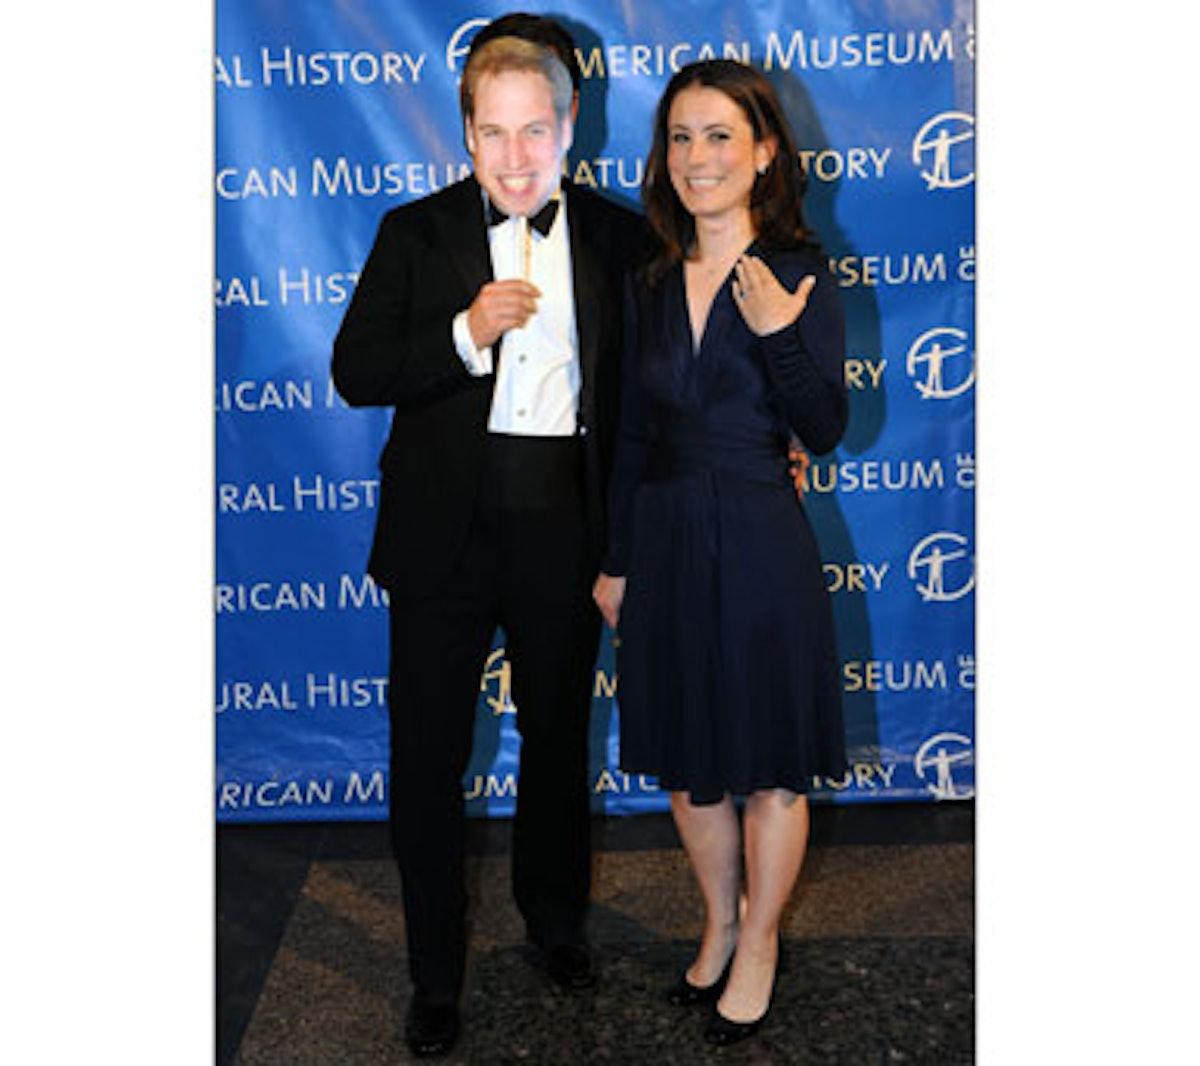 blog-amnh-5085-Caitlin-and-Michael-Davis-RM.jpg